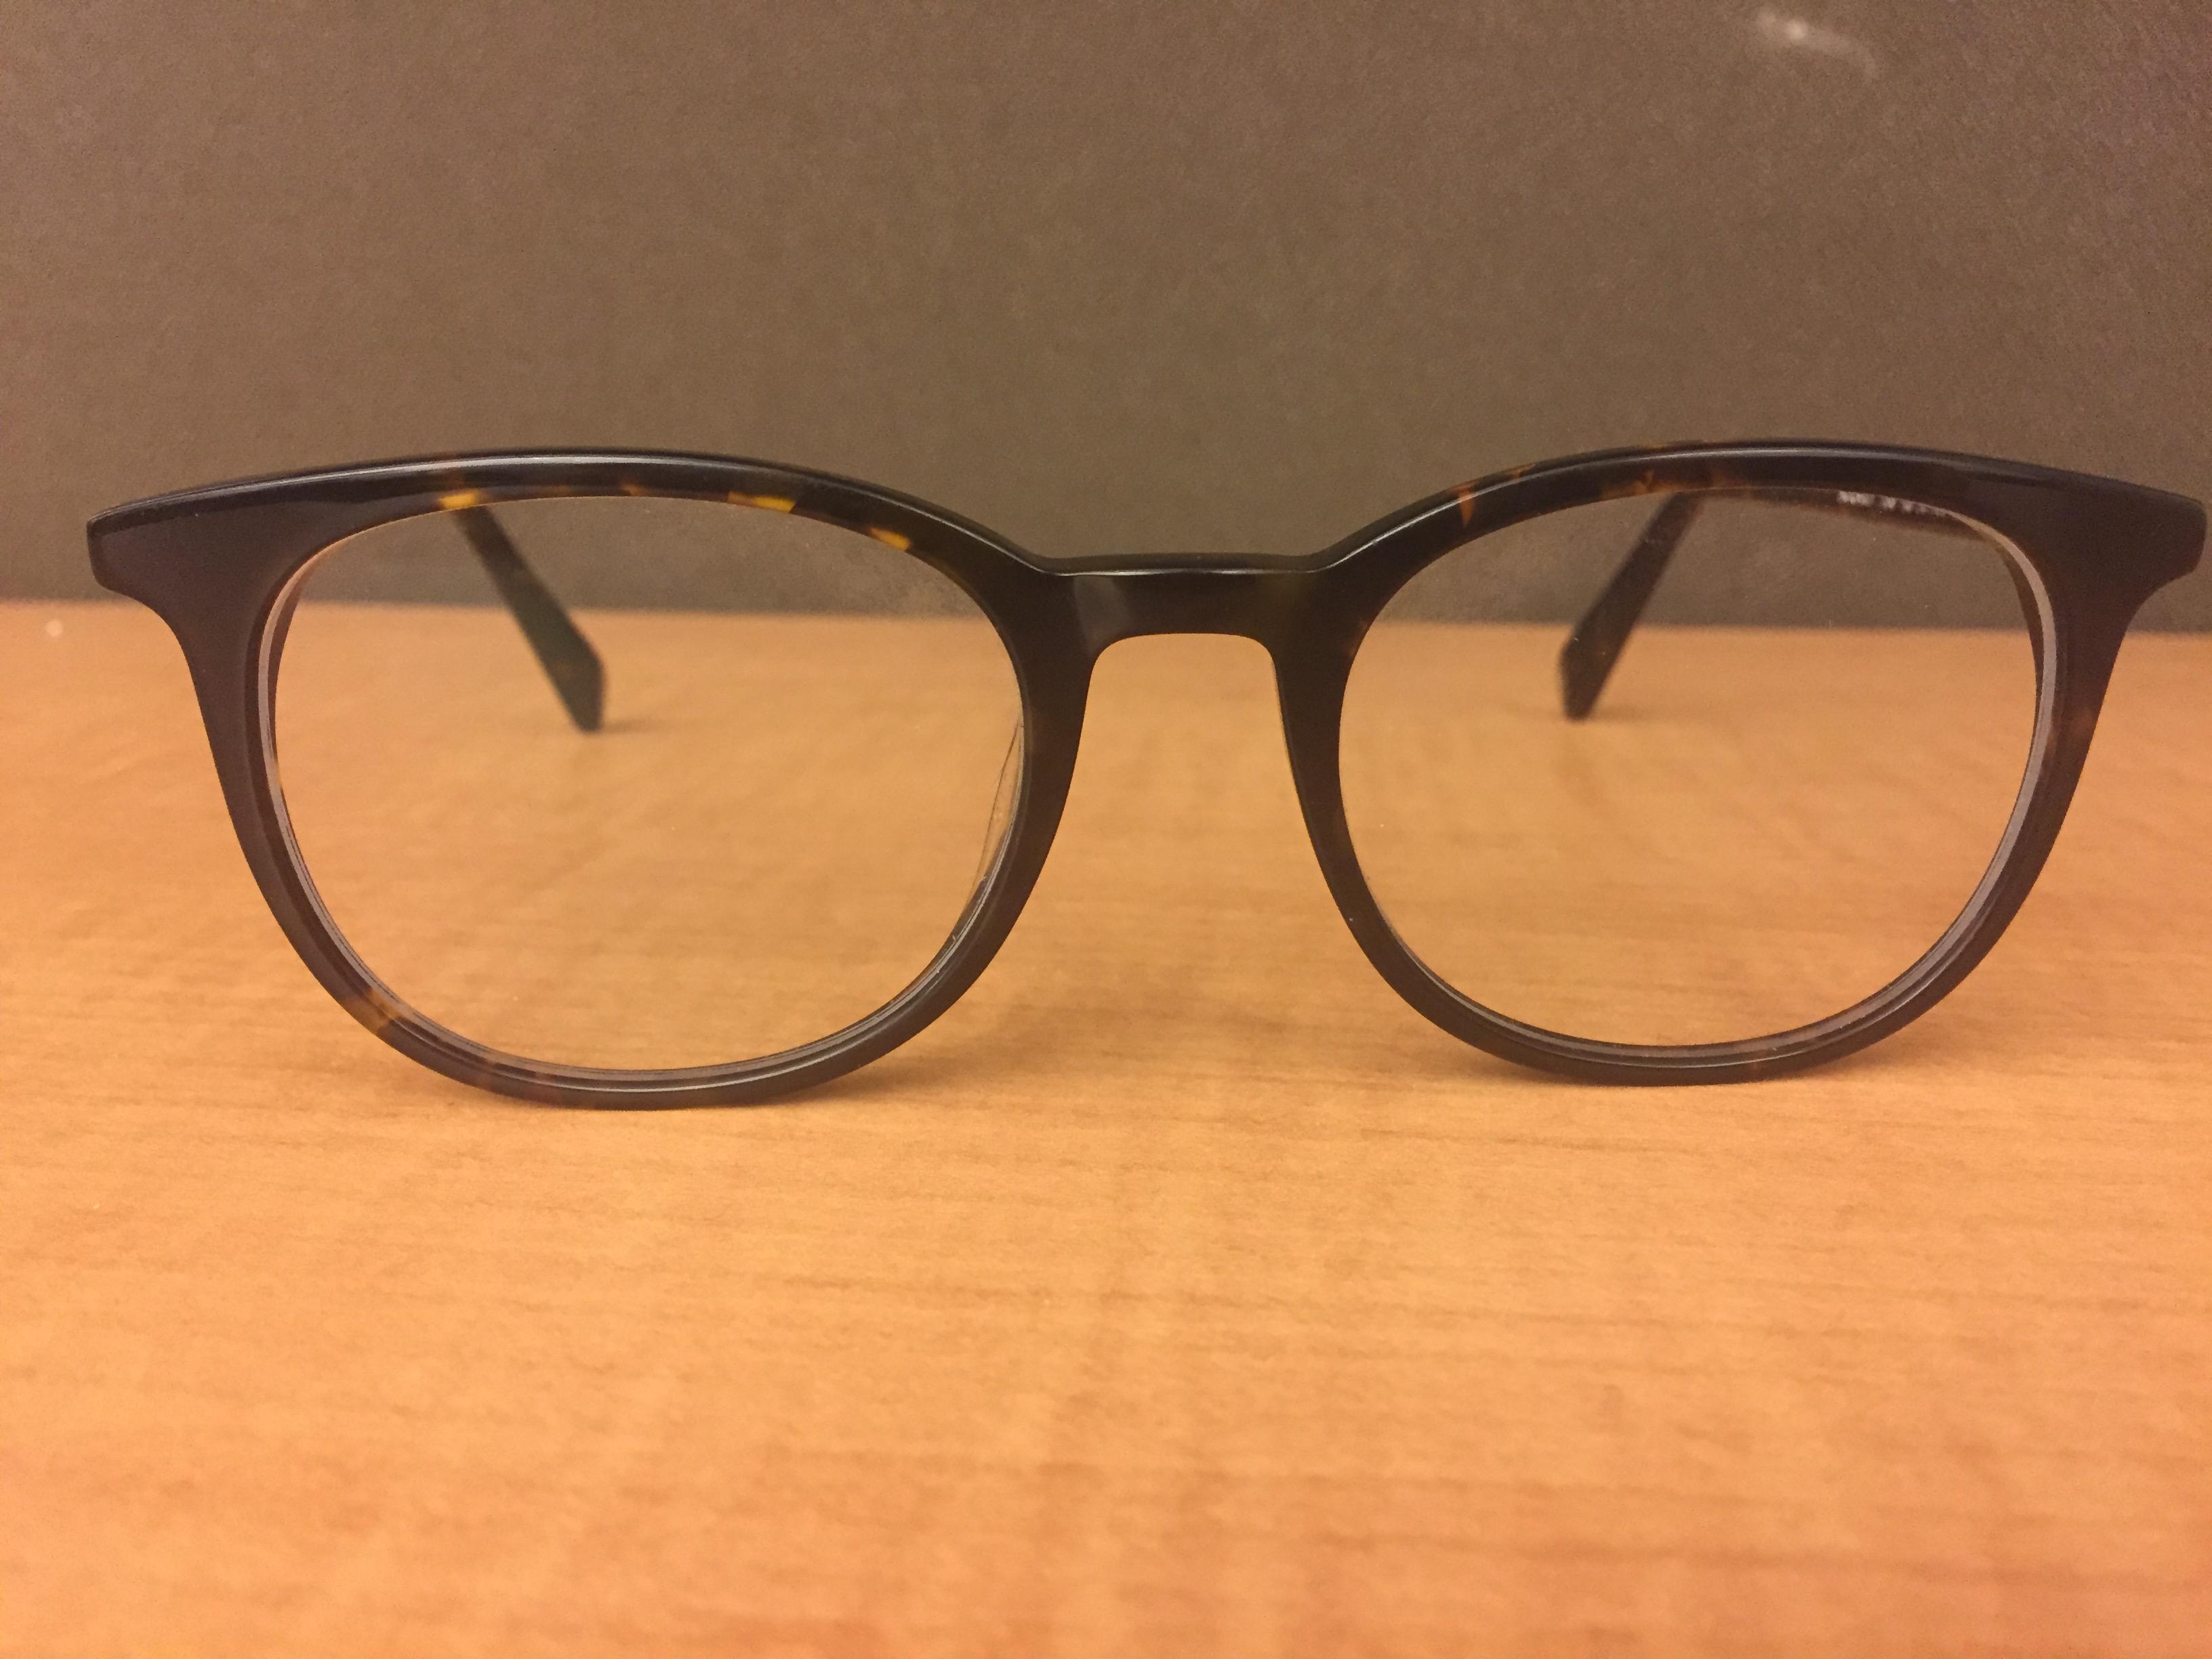 A pair of Warby Parker glasses. (Photo: Jillian Jorgensen/New York Observer)